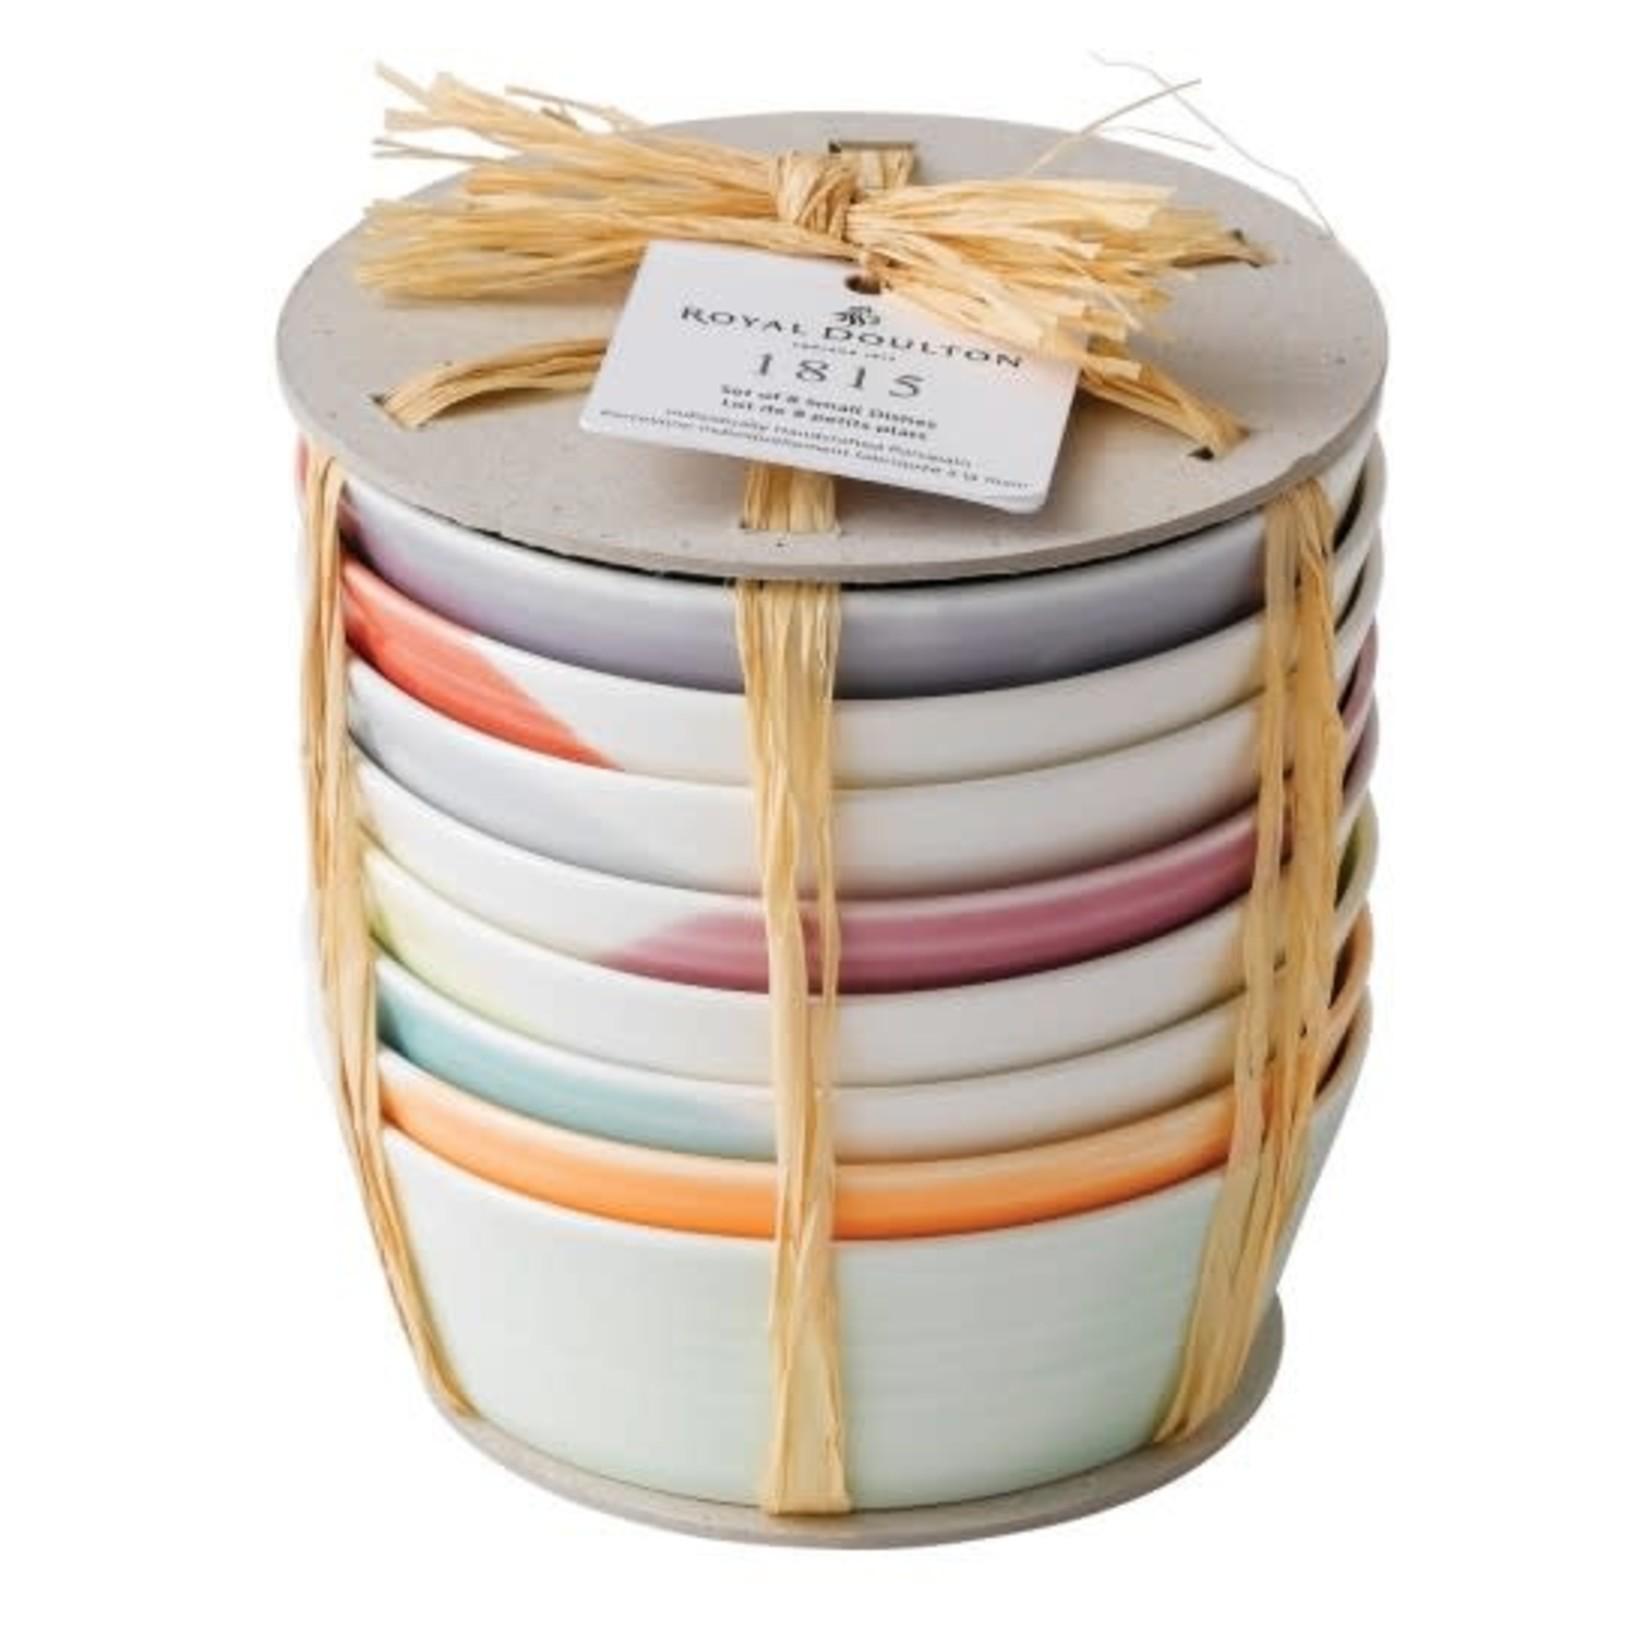 Royal Doulton 1815 Tapas Dishes Set of 8